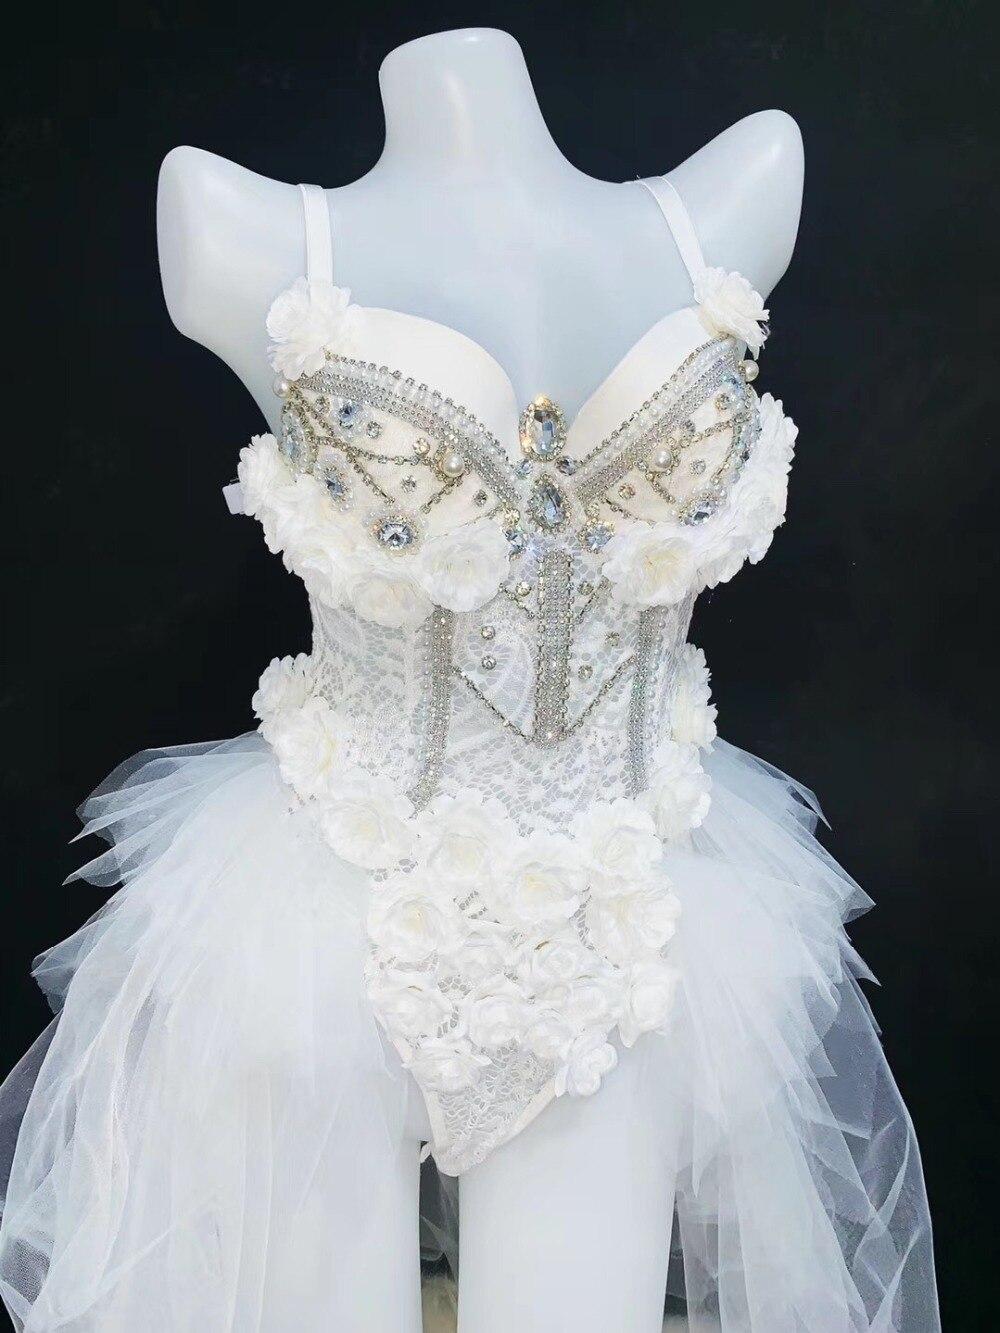 2019 Sexy White Lace Rhinestone Bodysuit female singer DJ DS dance Wear stage costume Leotard nightclub